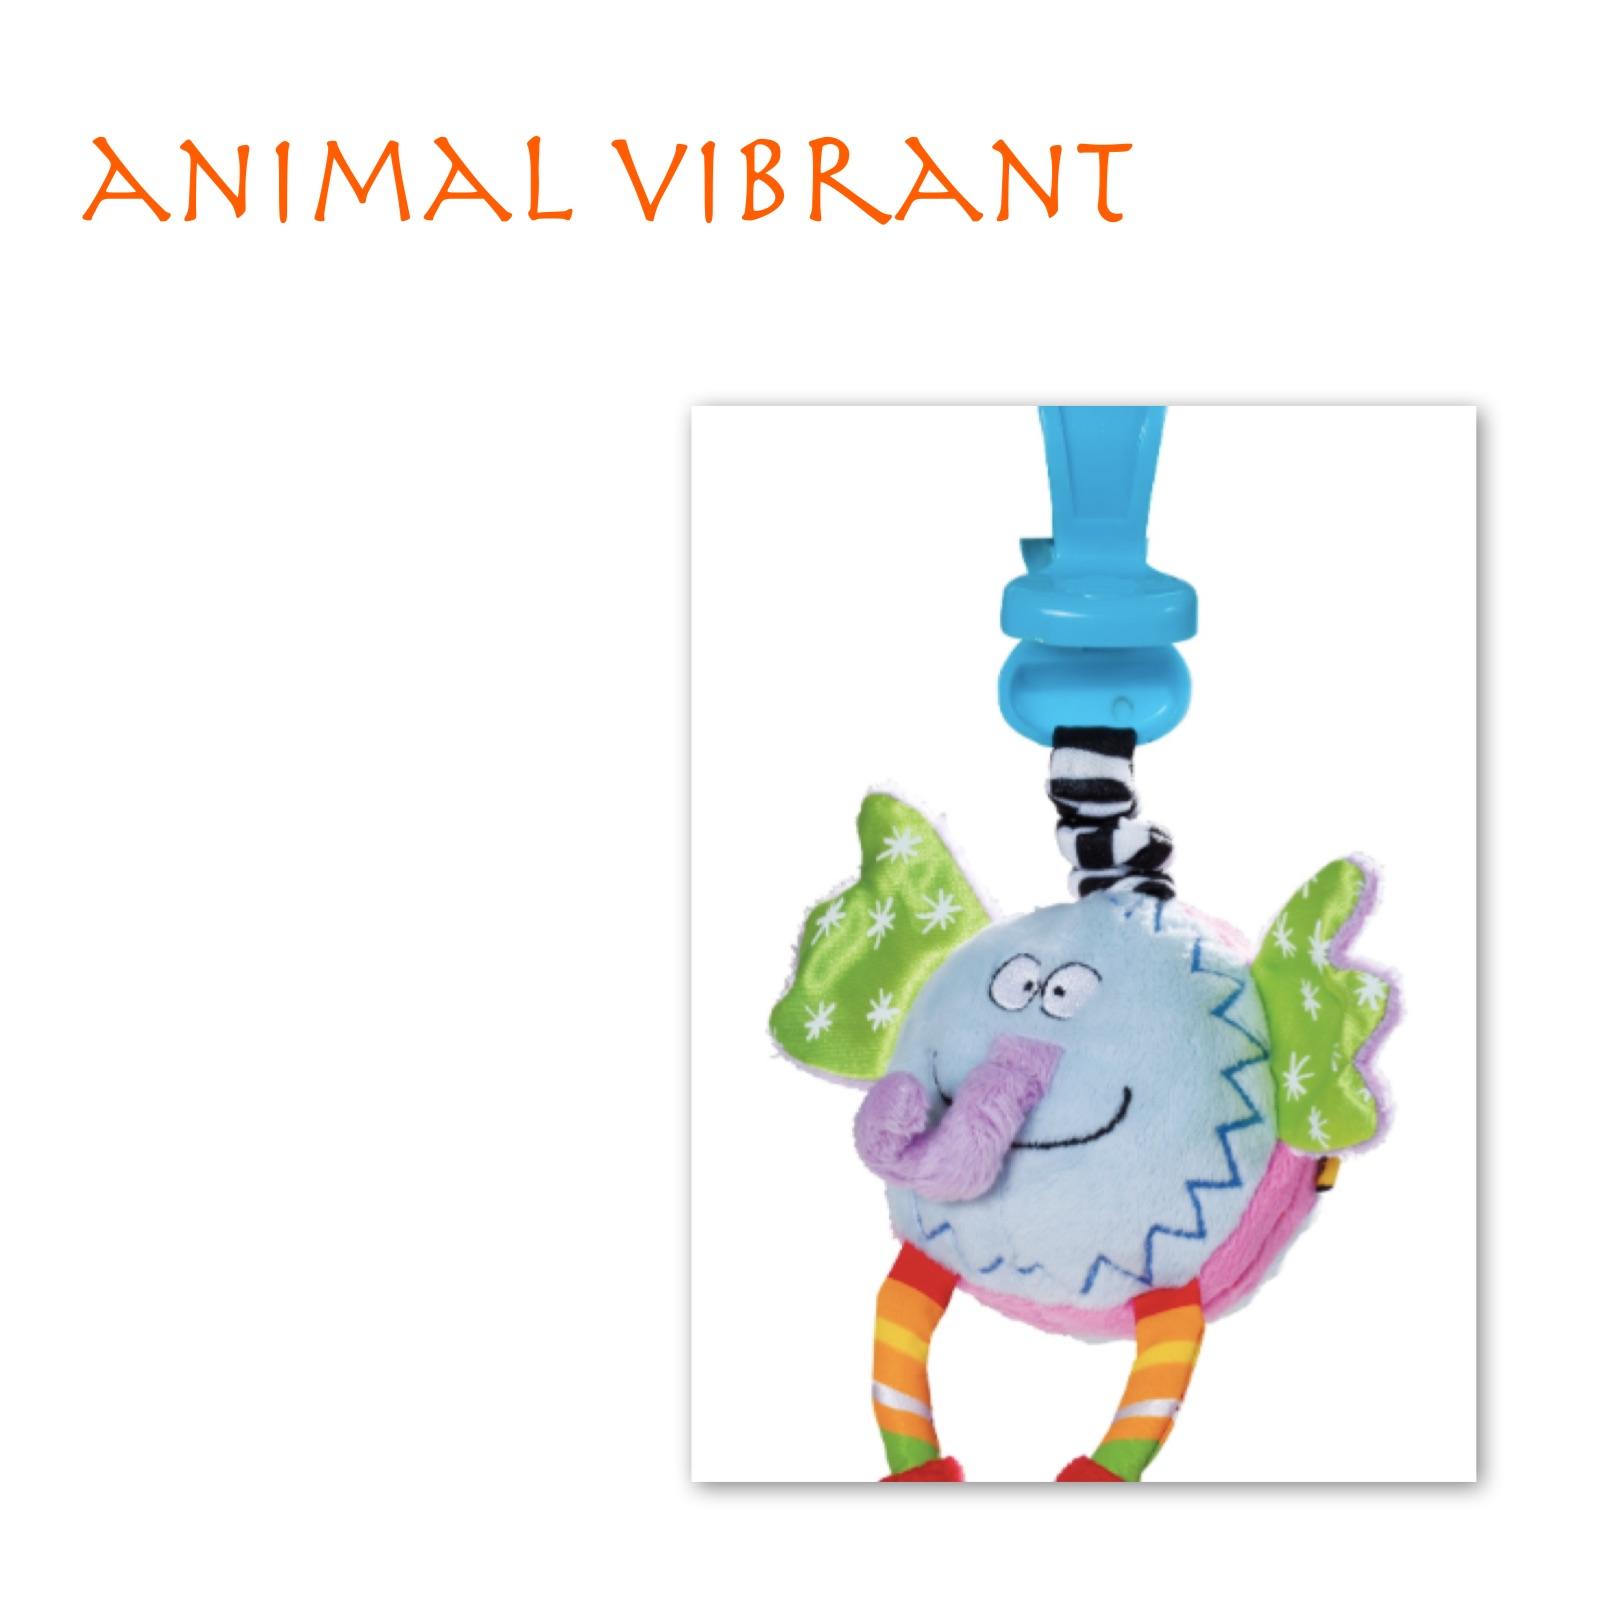 Animal vibrant